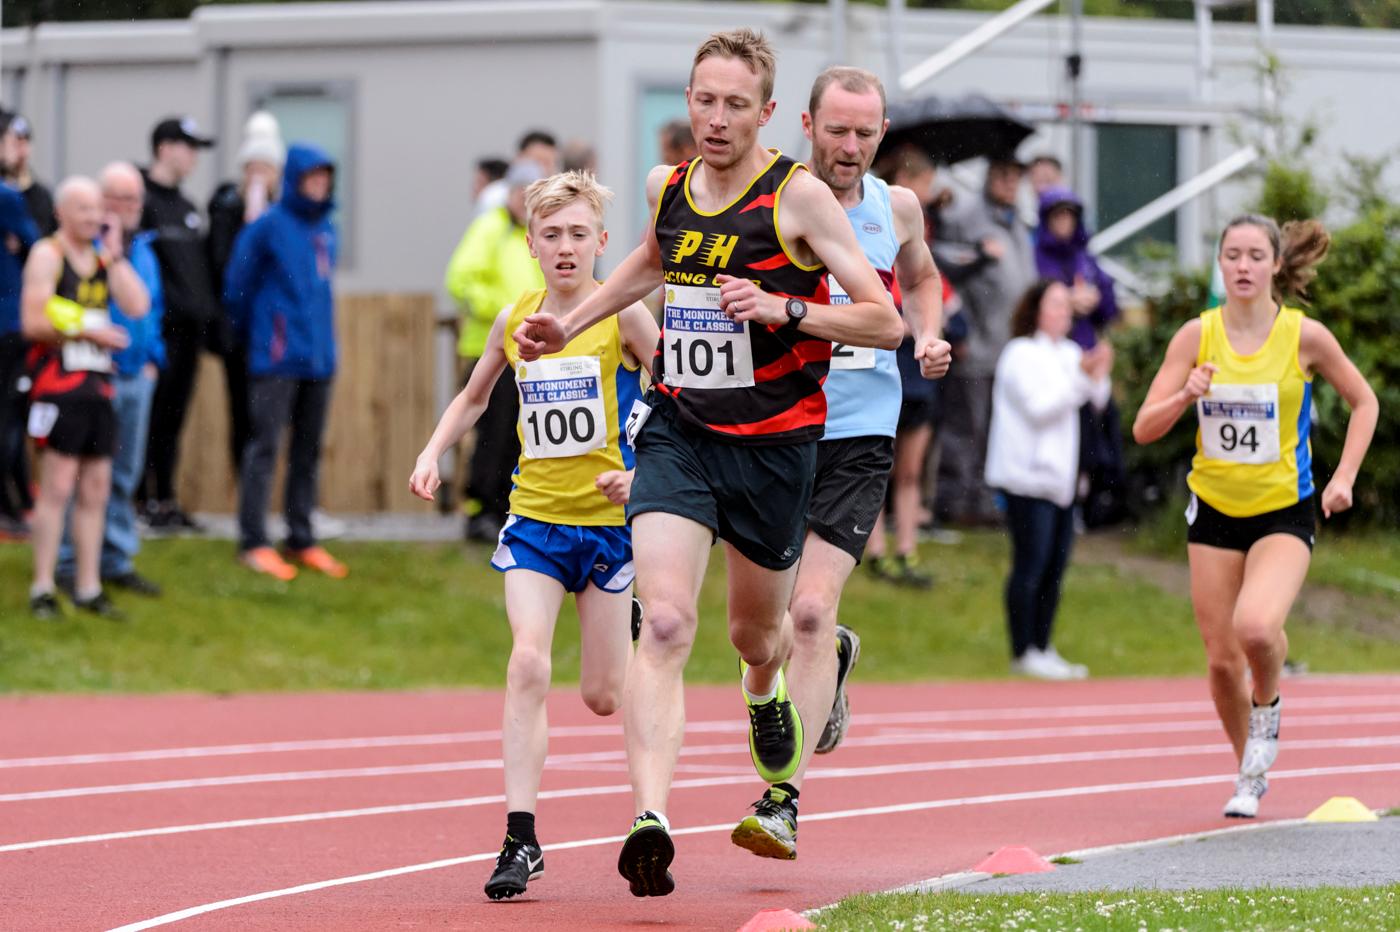 Monument Mile Classic; Equality seminar; Mark Telford - Scottish Athletics